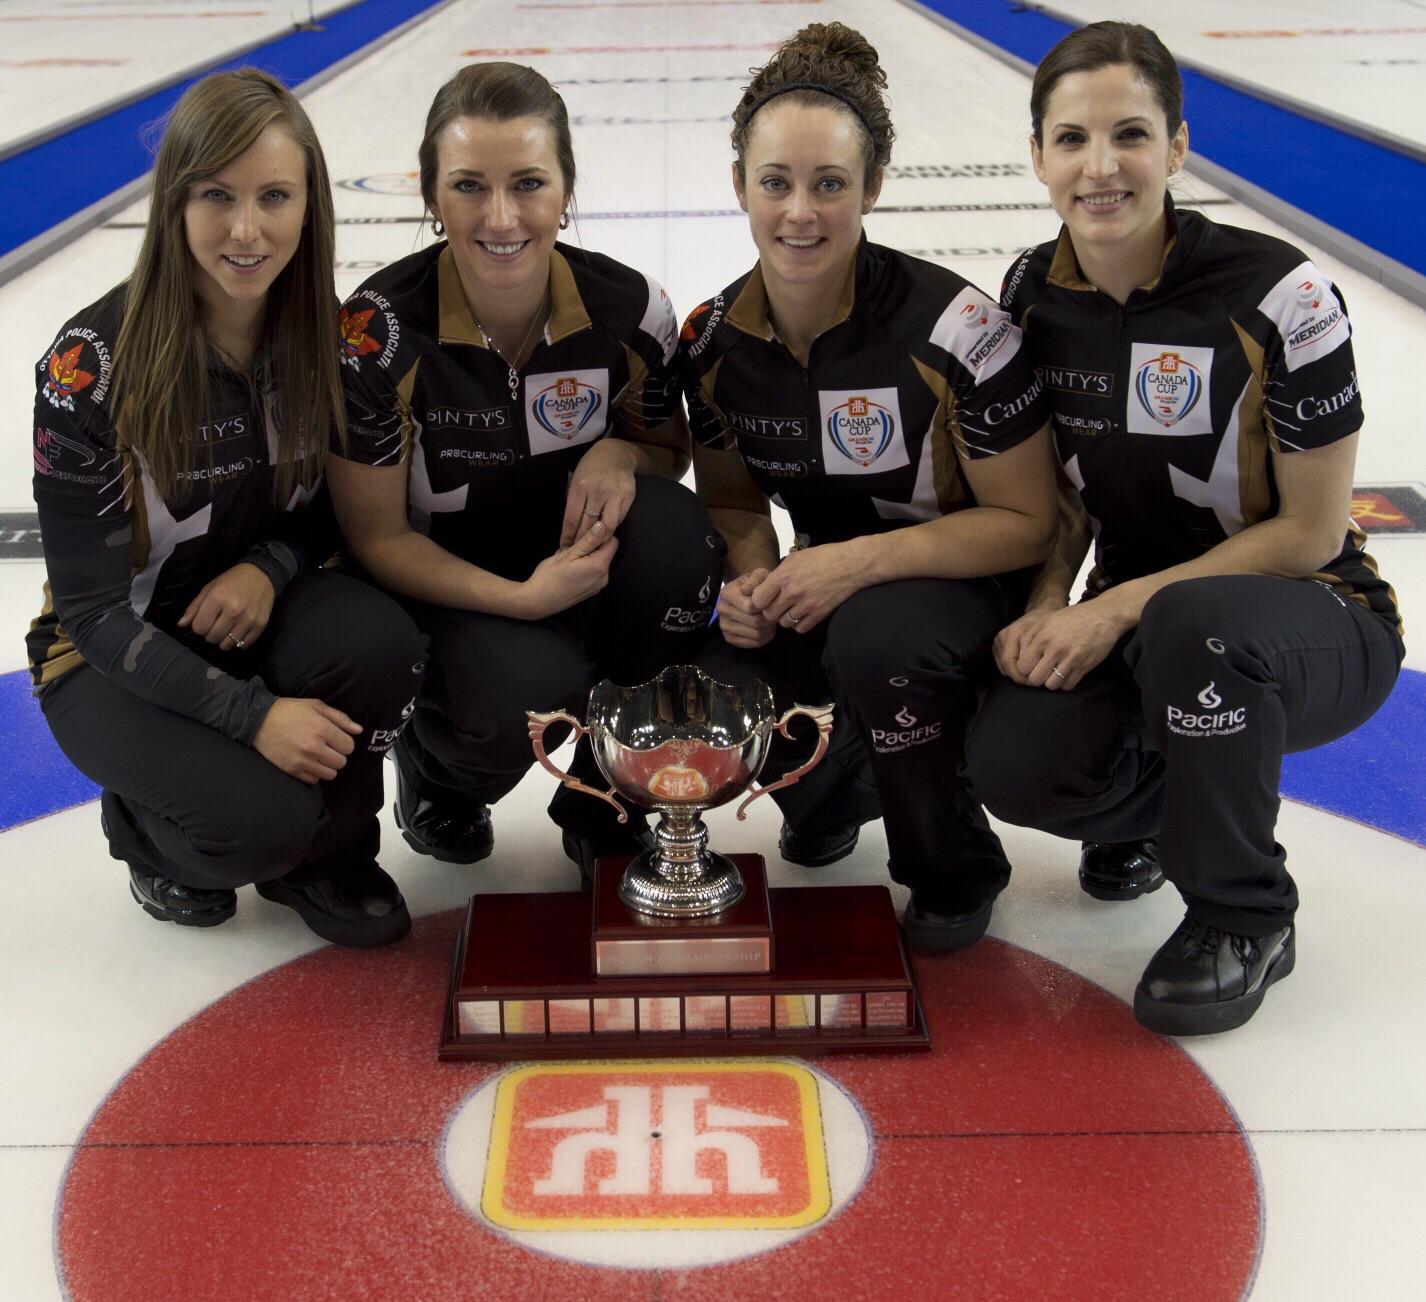 Michael Burns - Curling Canada